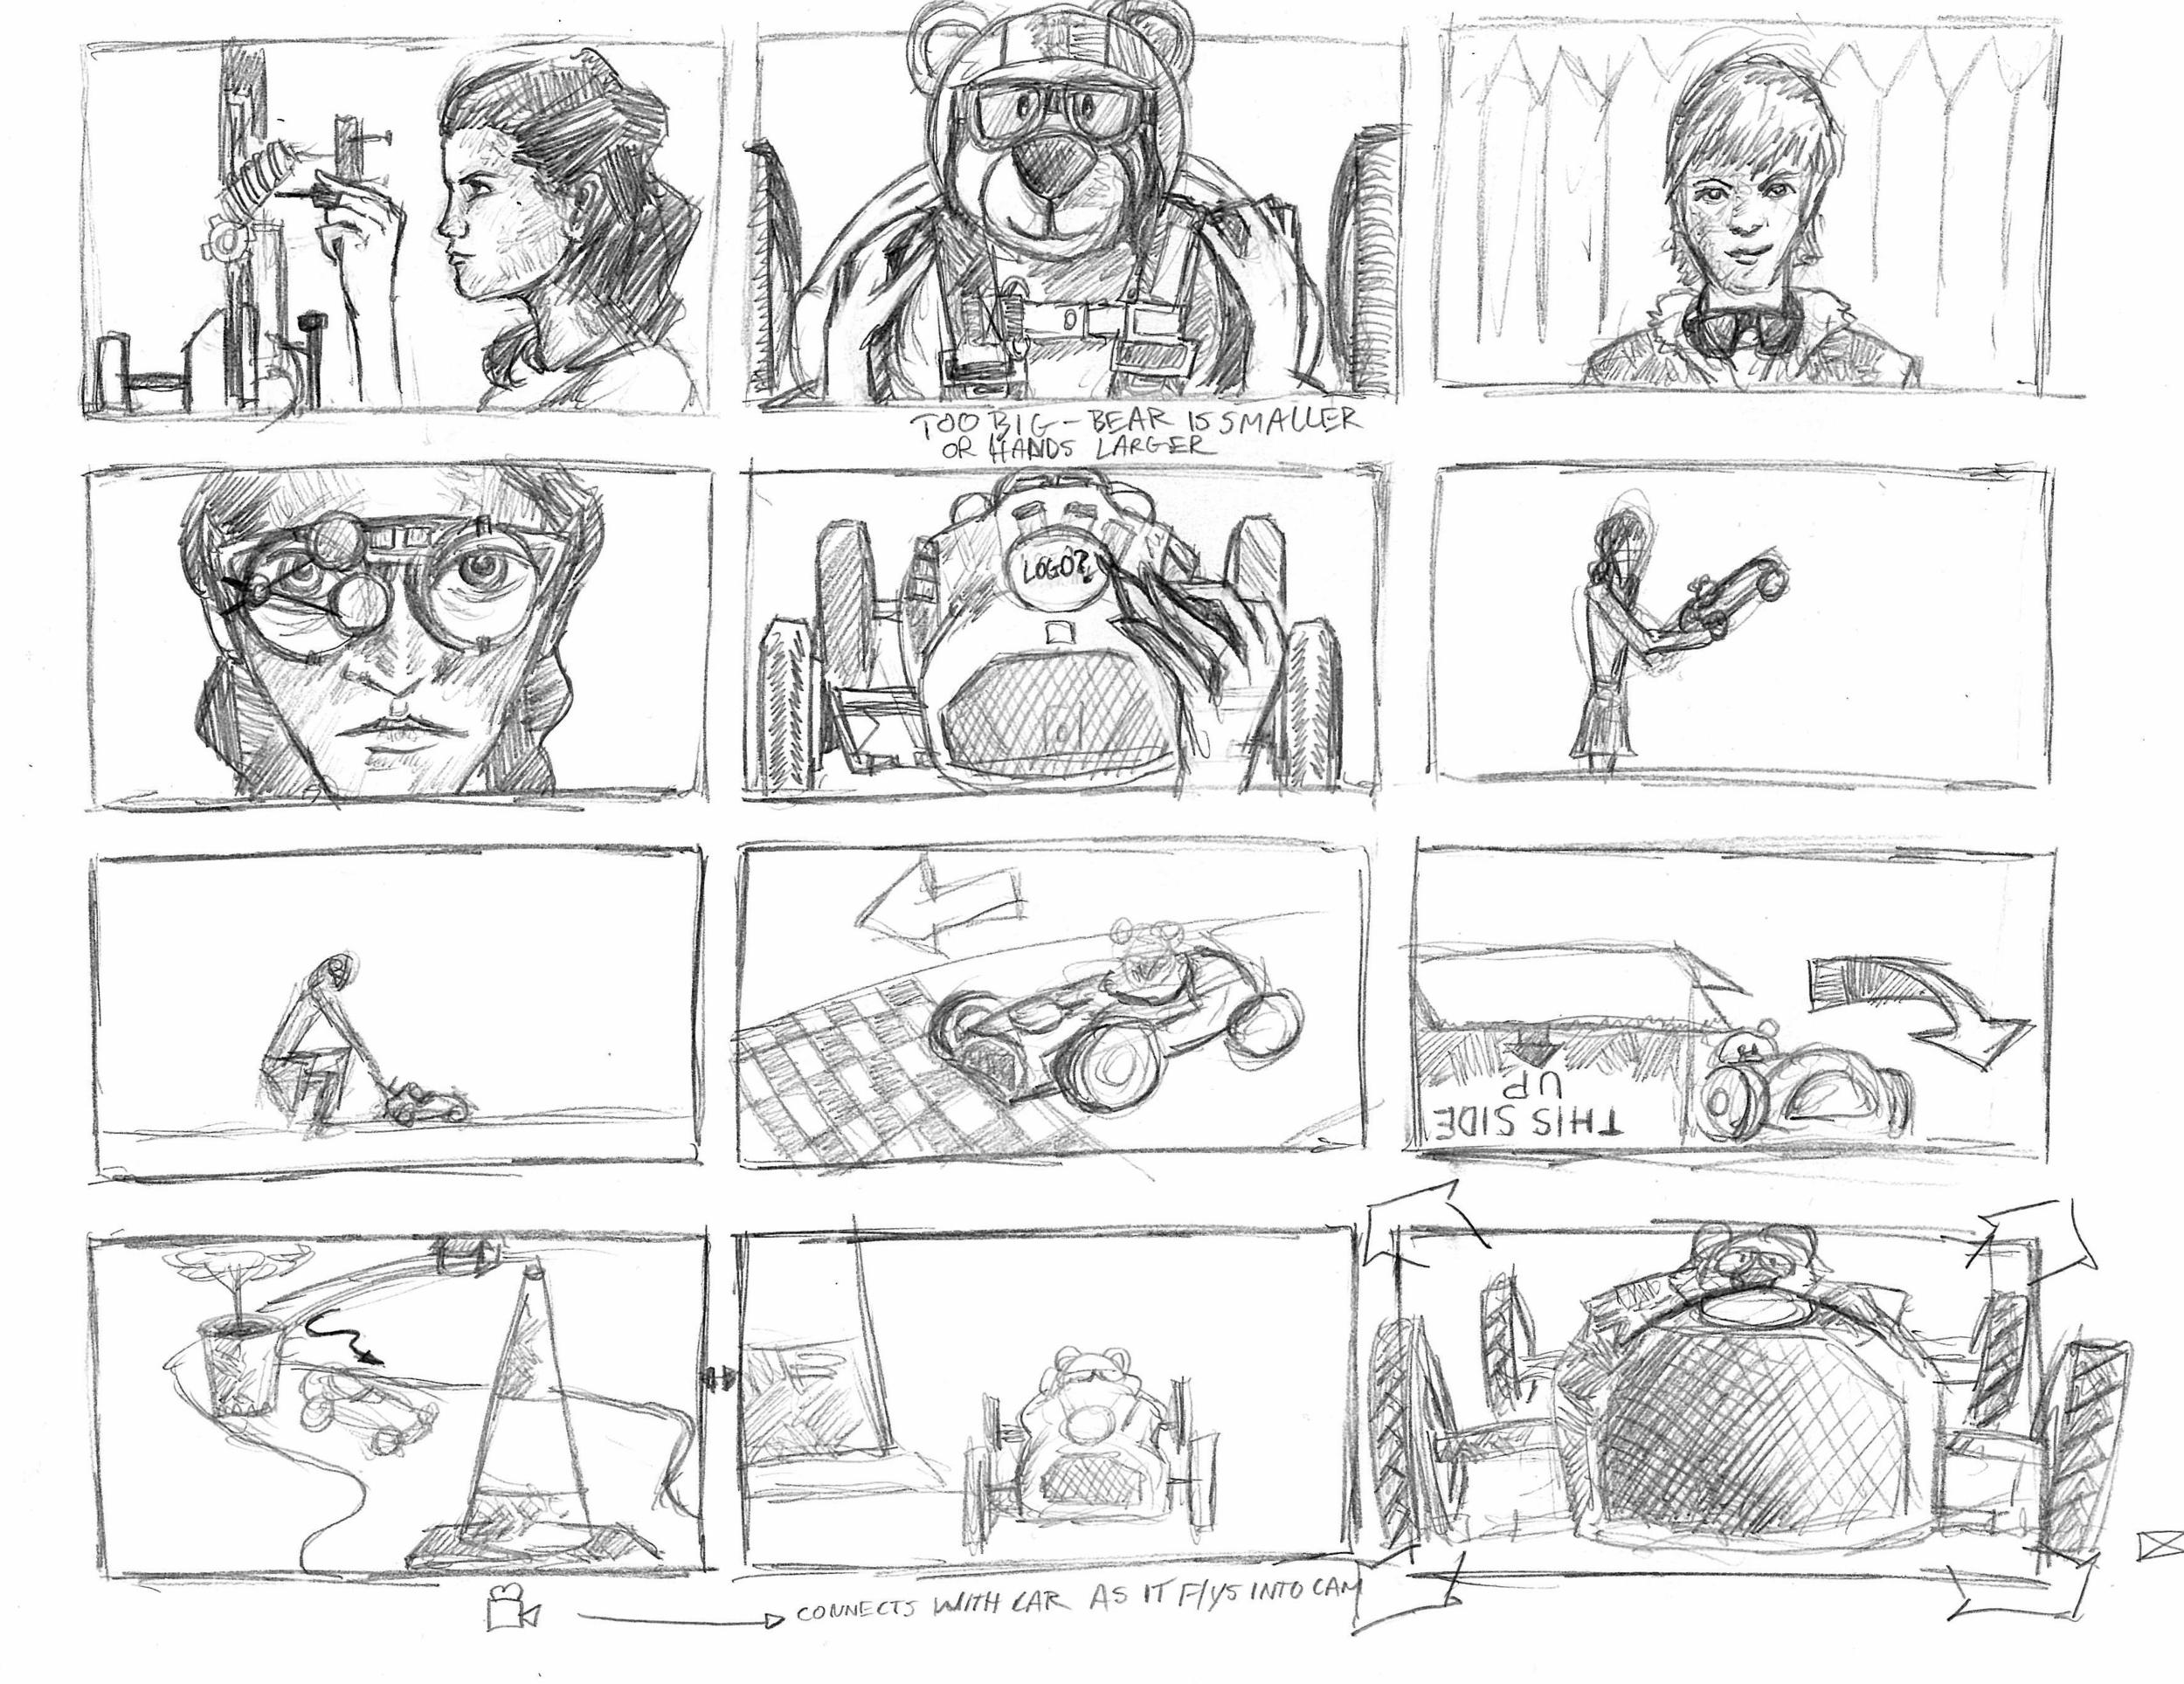 Prix Storyboard_PG003 - Film and TV - Jonathan B Perez - cREAtive Castle Studios.jpg